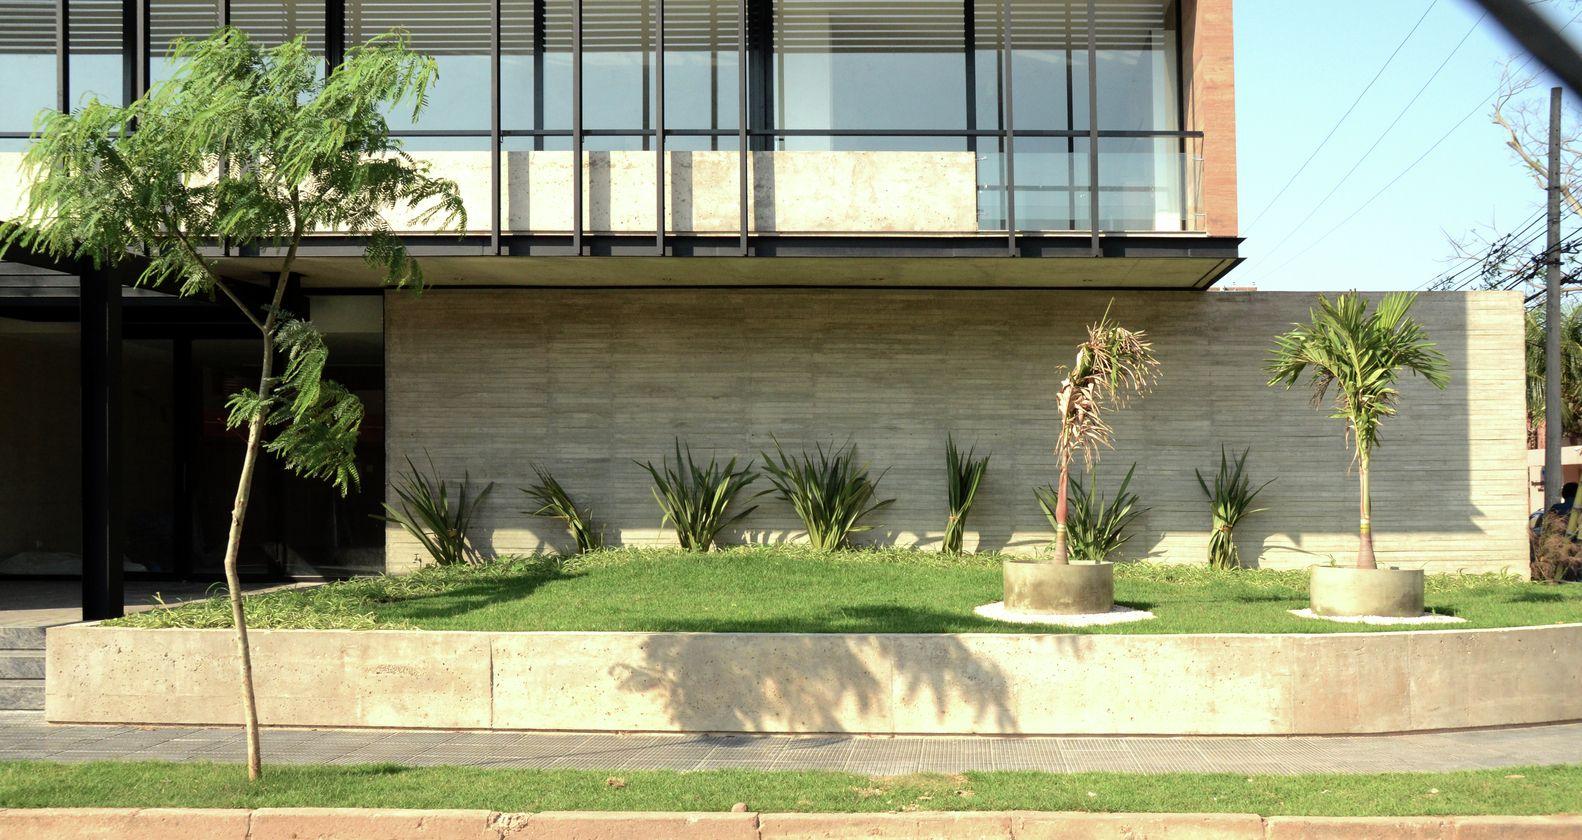 Gallery - ARIA Building / Sebastián Fernández de Córdova Frerking + Erika Peinado Vaca Diez - 7